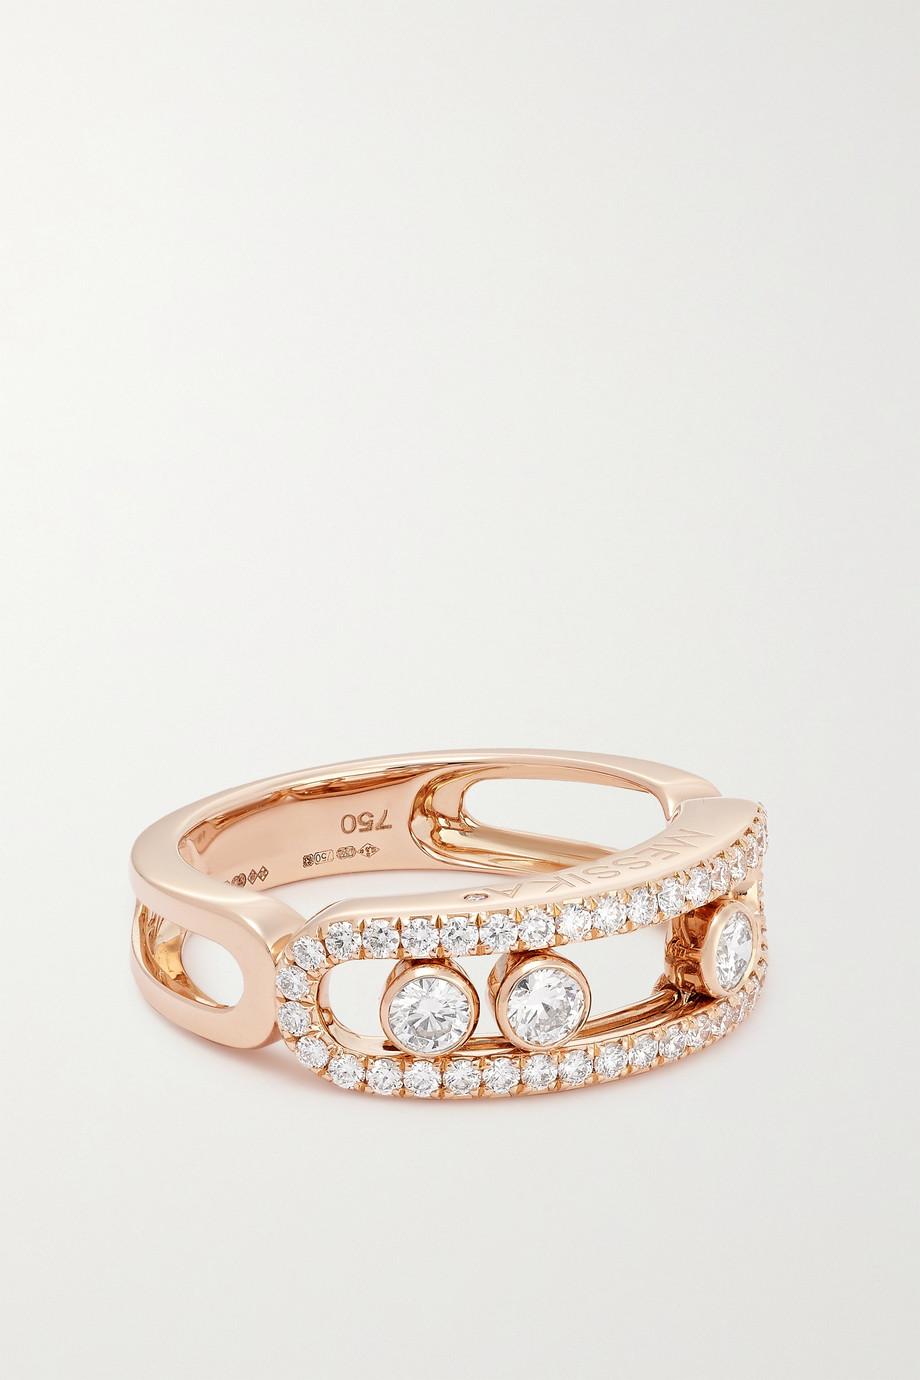 Messika Bague en or rose 18 carats et diamants Move